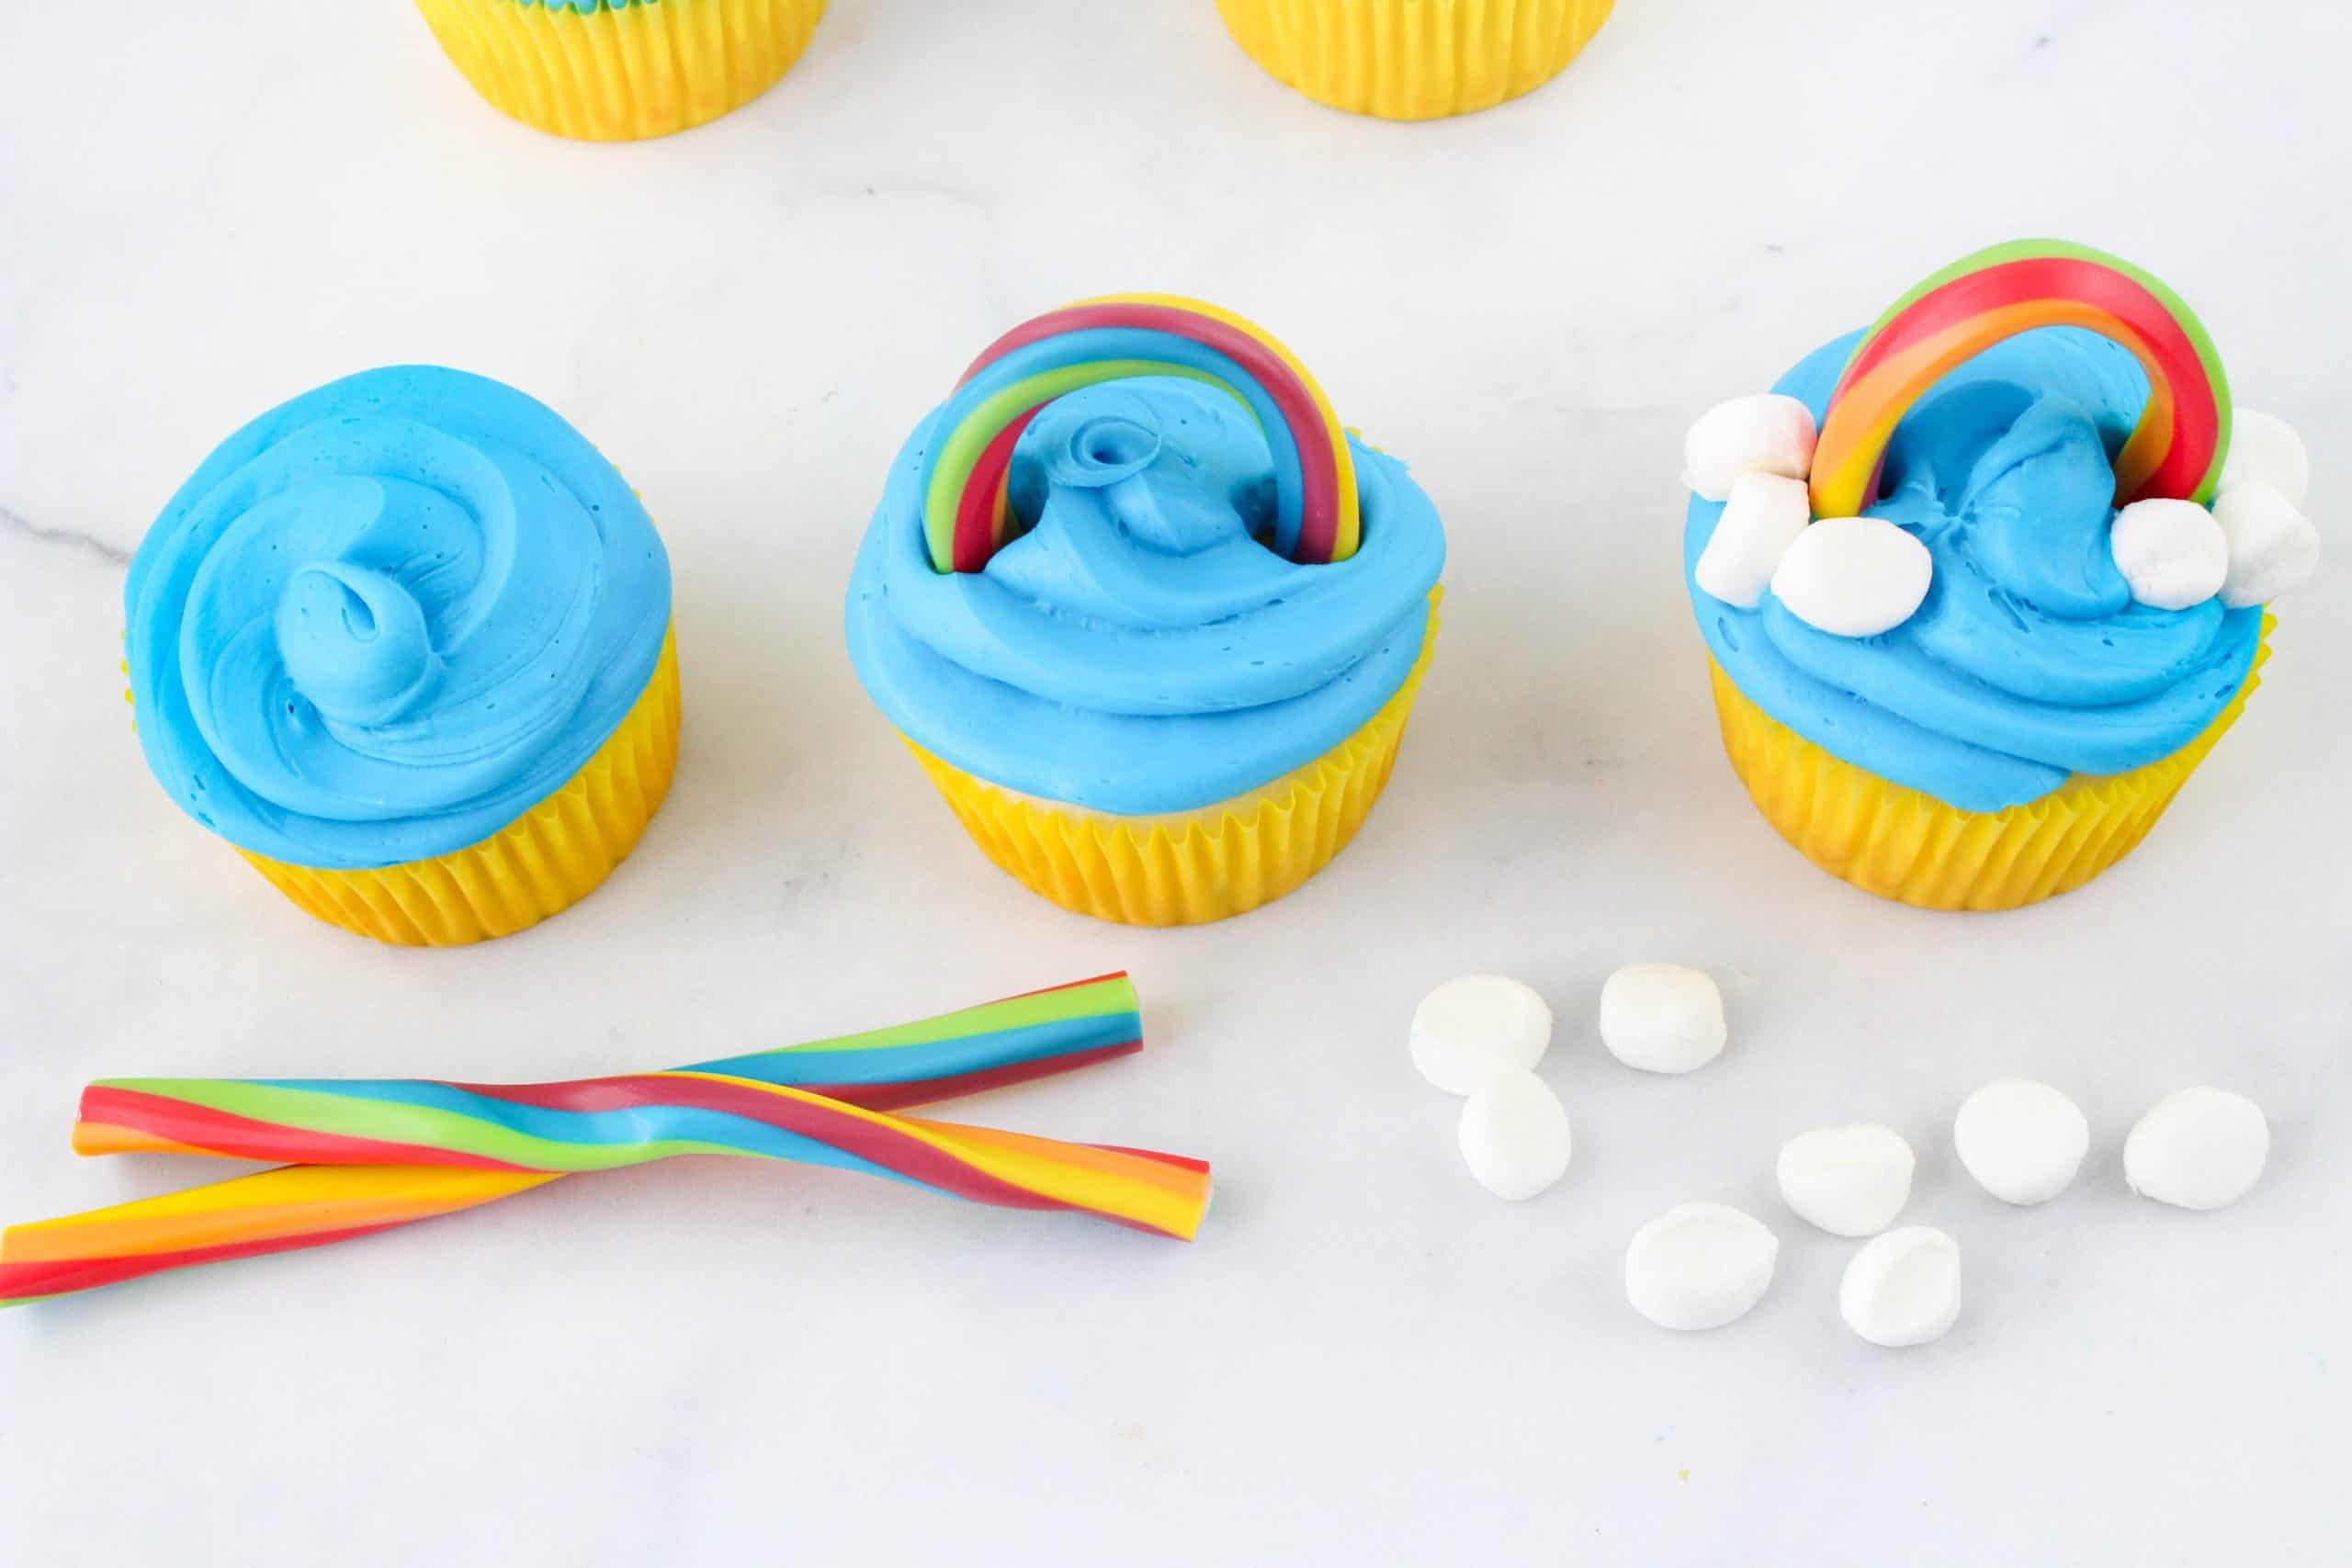 Rainbow Cupcakes with licorice rope